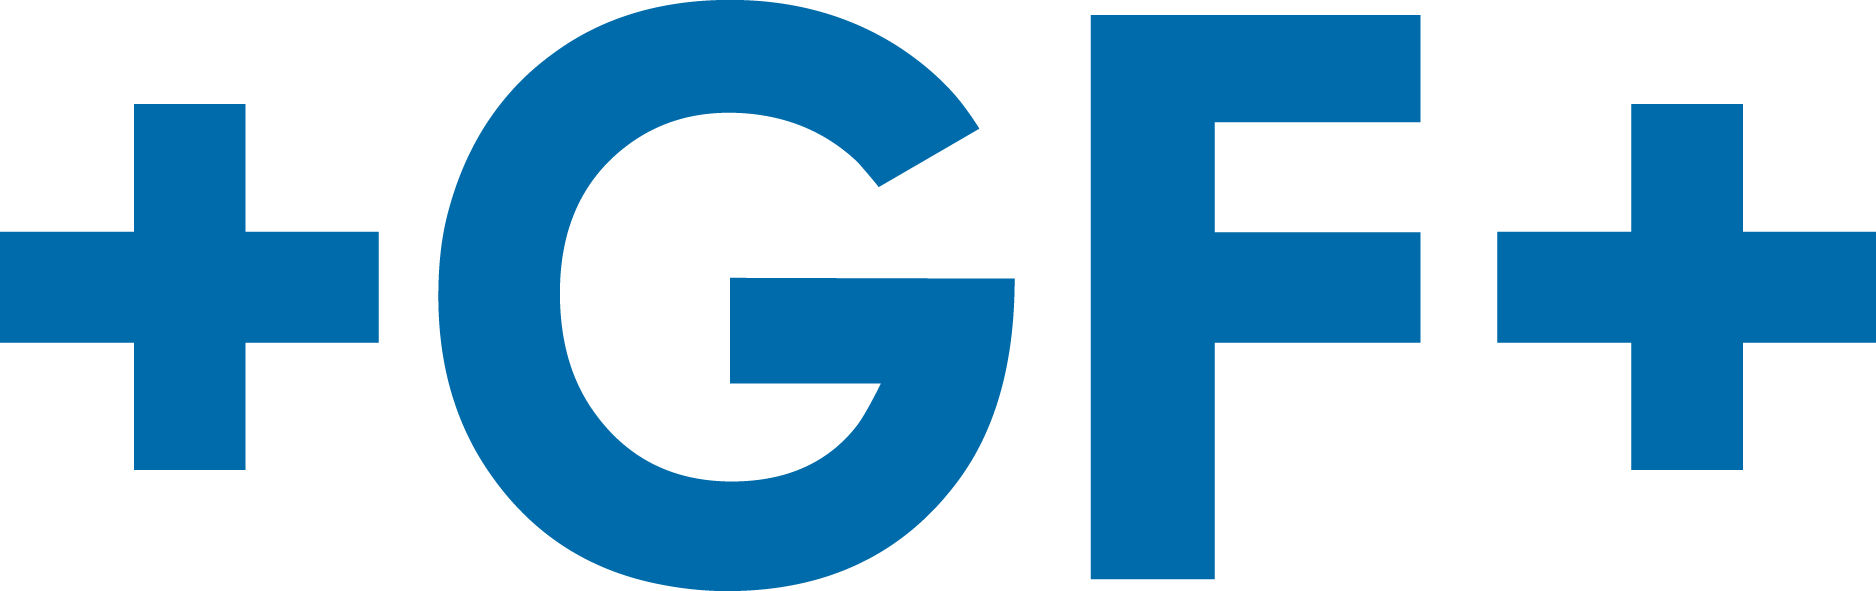 GF Casting Solutions Werdohl GmbH Werdohl